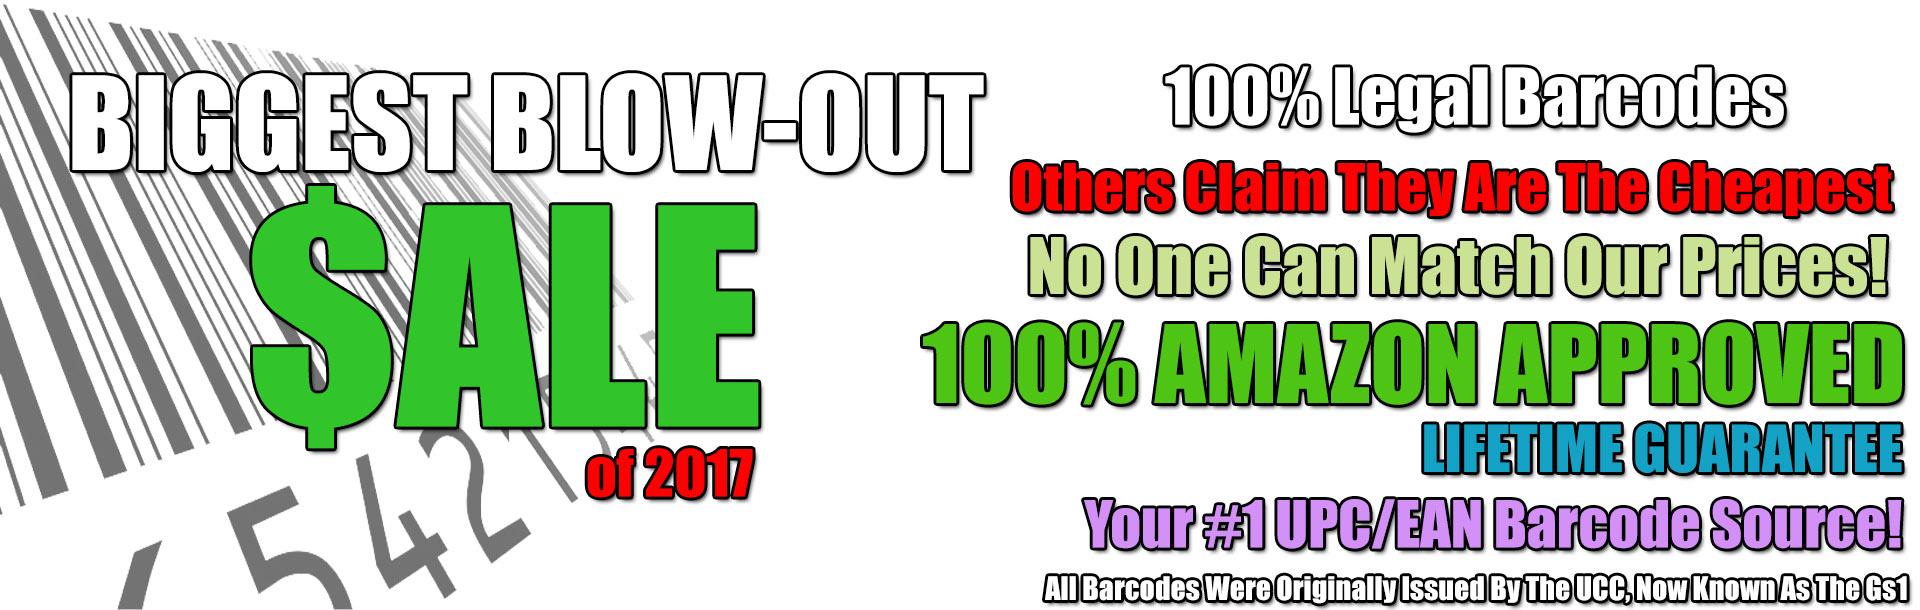 UPC Barcodes Sale 2017